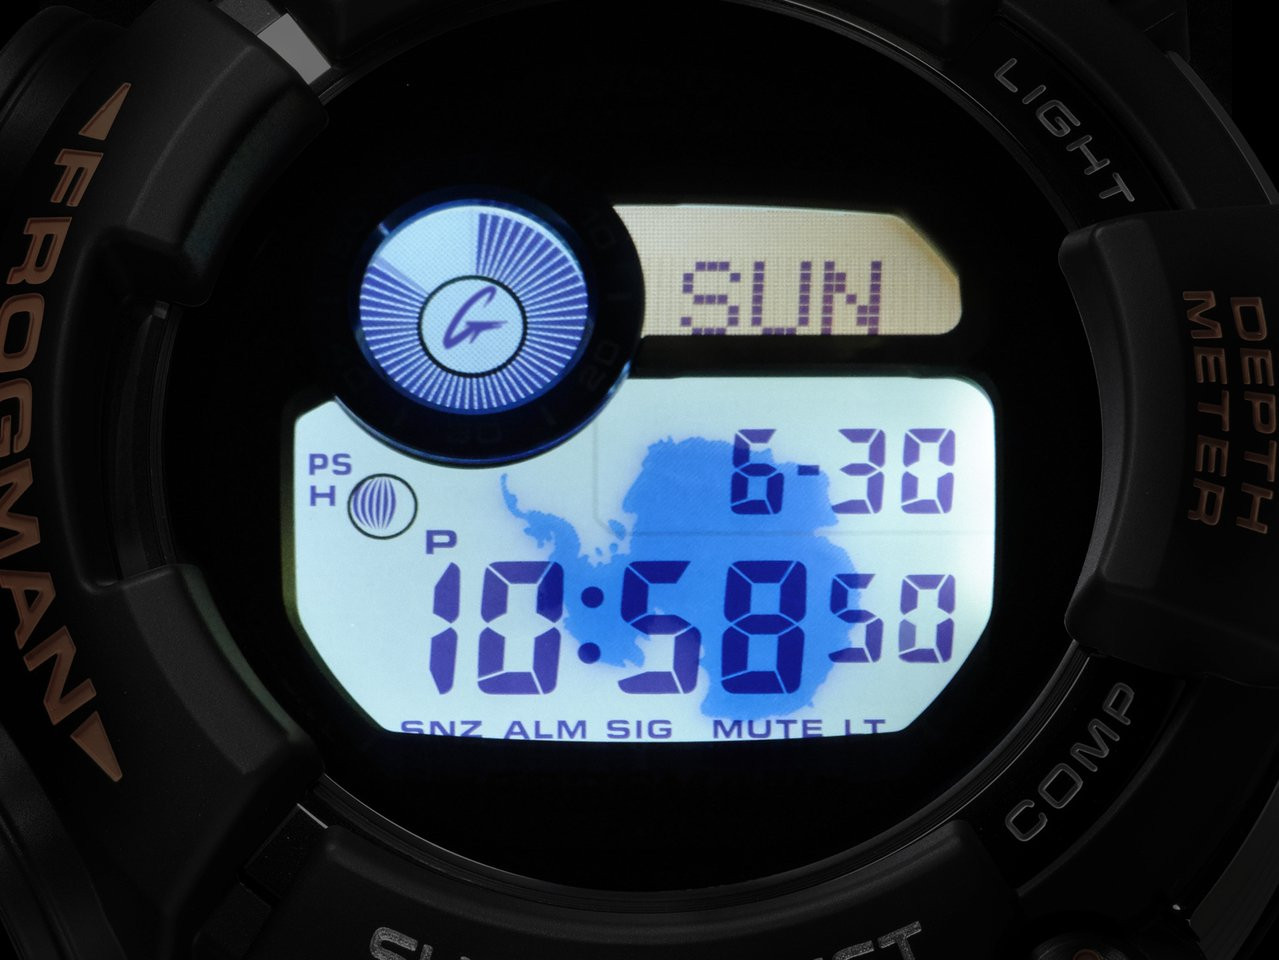 FROGMAN系列限量紀念GWF-D1000ARR腕表的冷光照明浮現南極洲圖樣。...